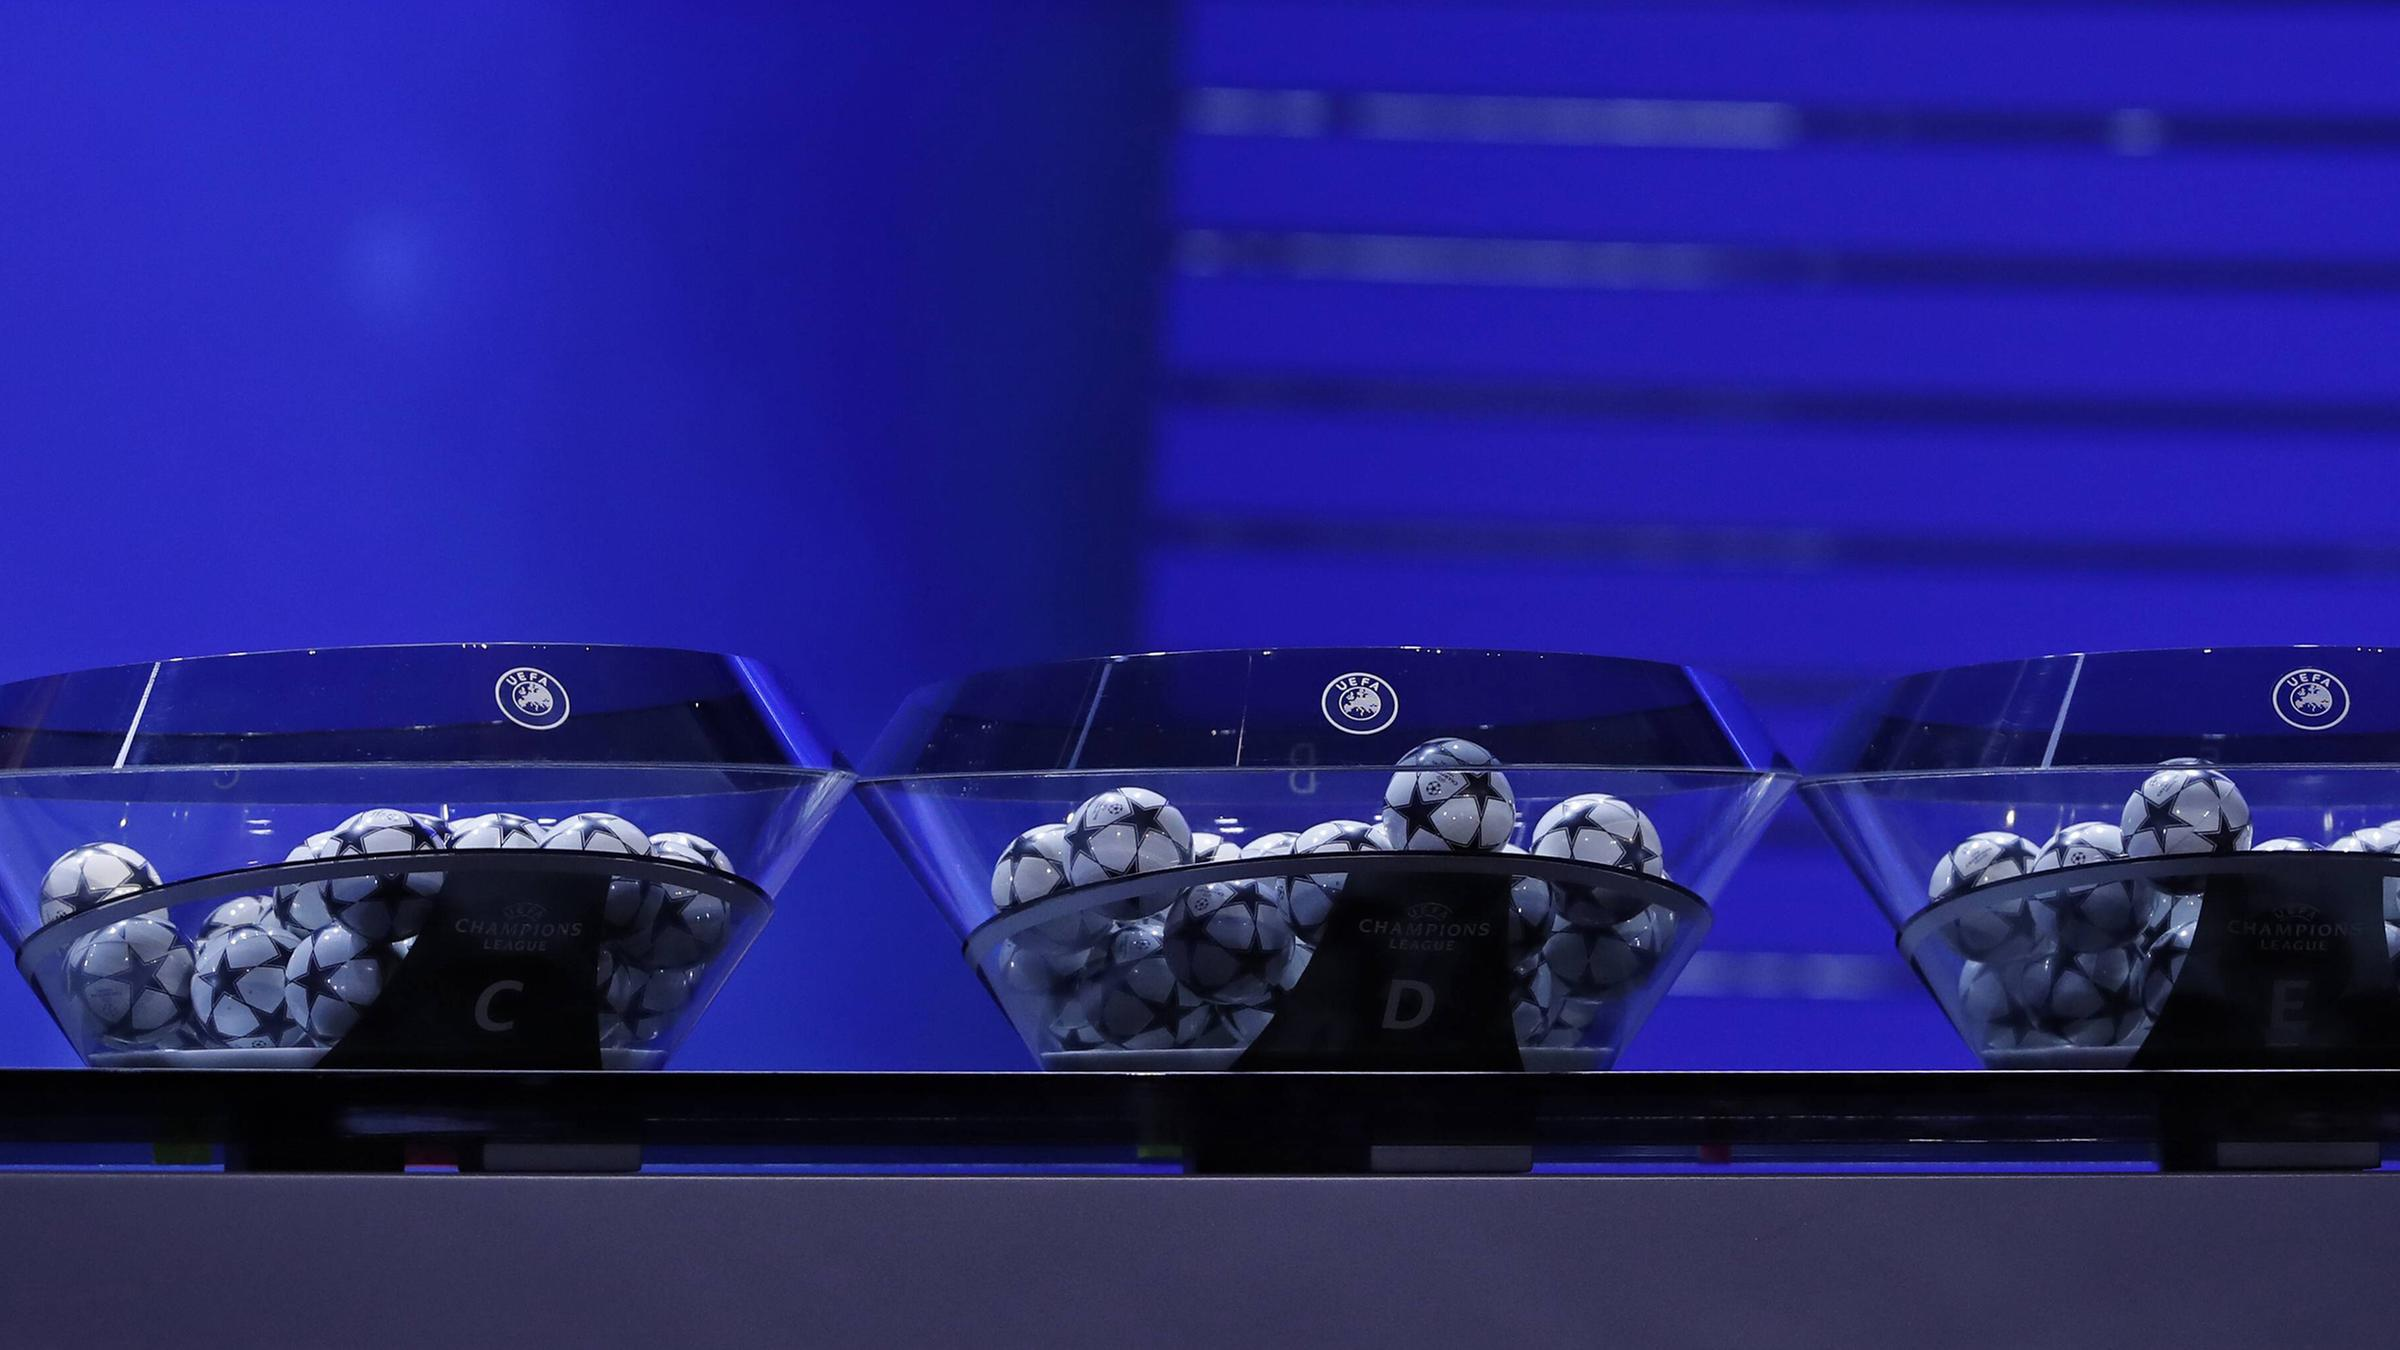 zdf de champions league auslosung